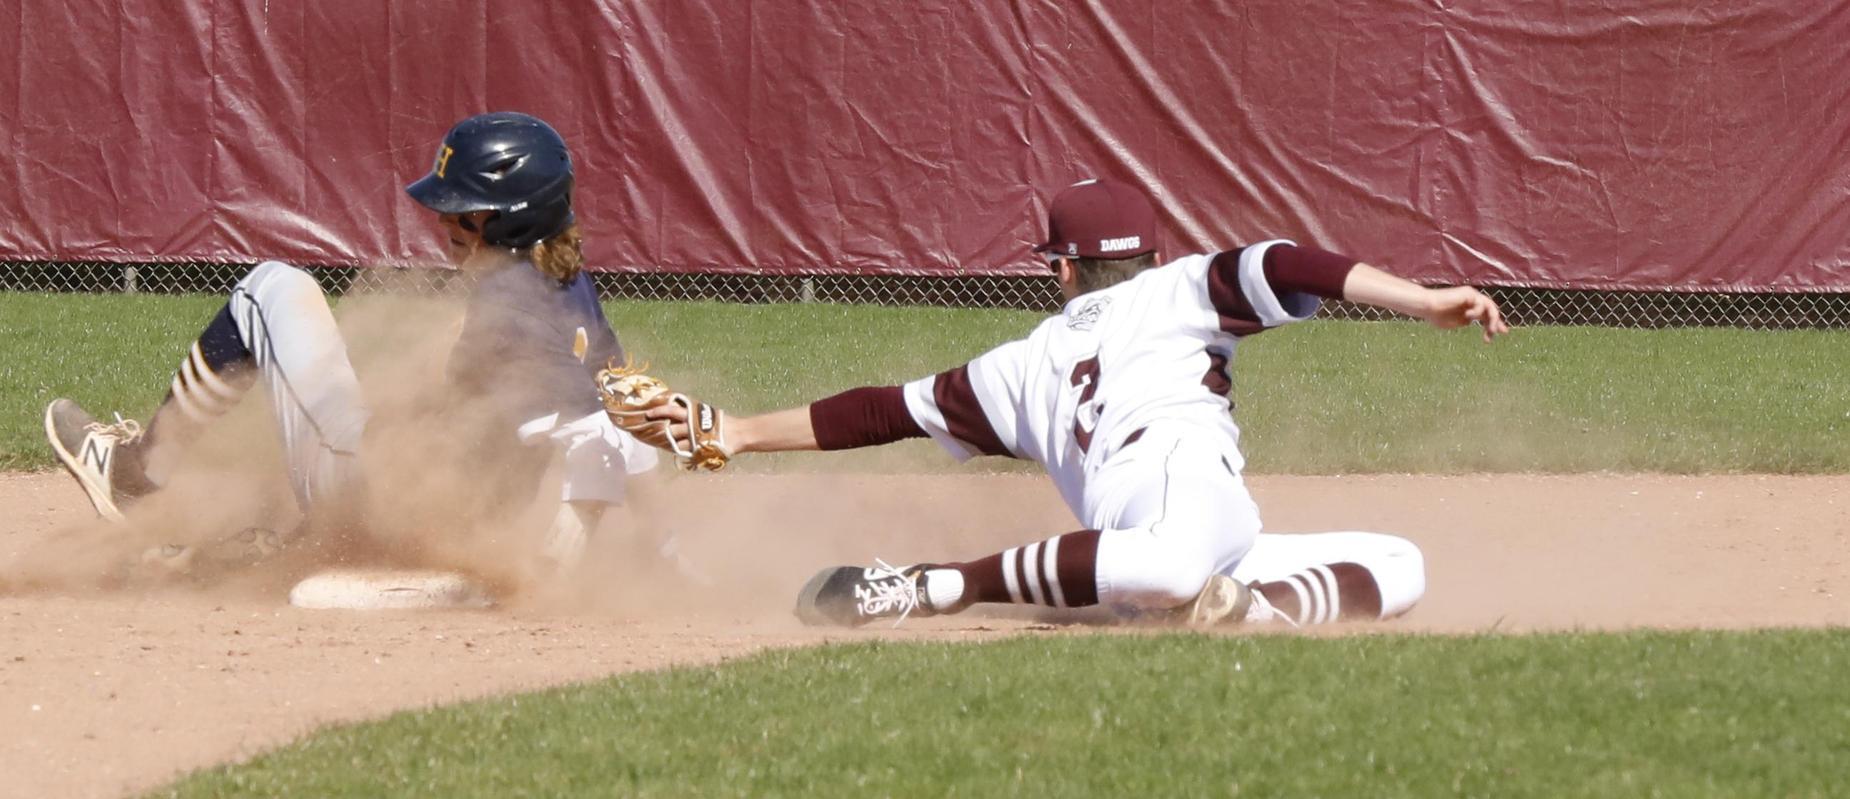 baseball player in white uniform touches boy in blue uniform with baseball mitt